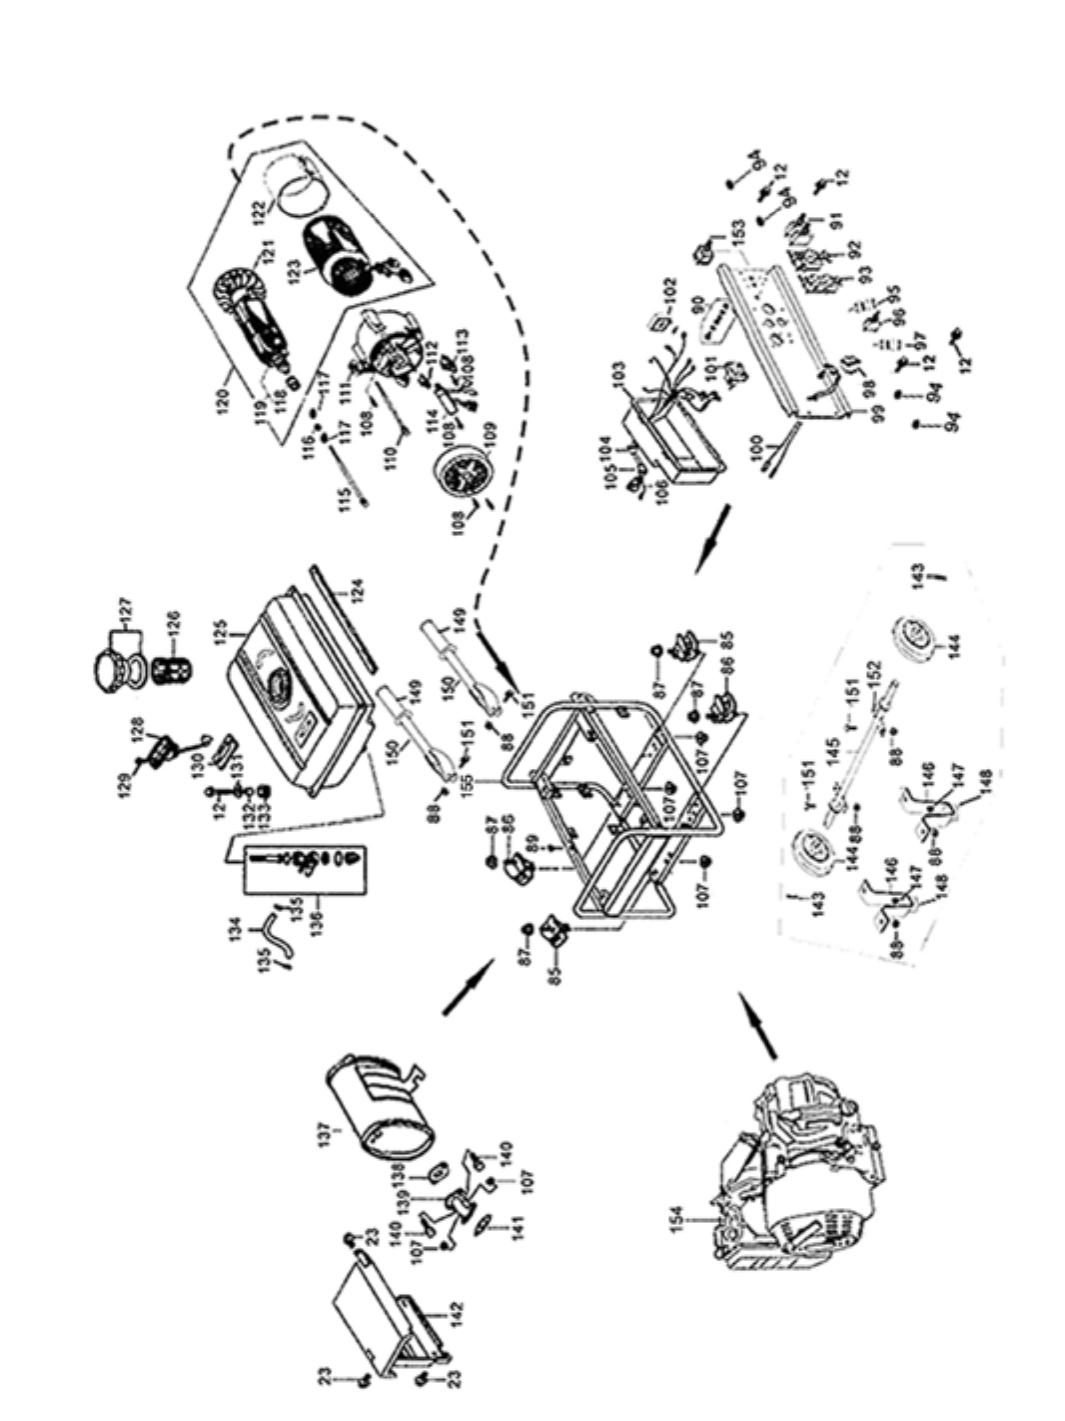 Handleiding Duromax XP4400E (pagina 29 van 33) (English) on